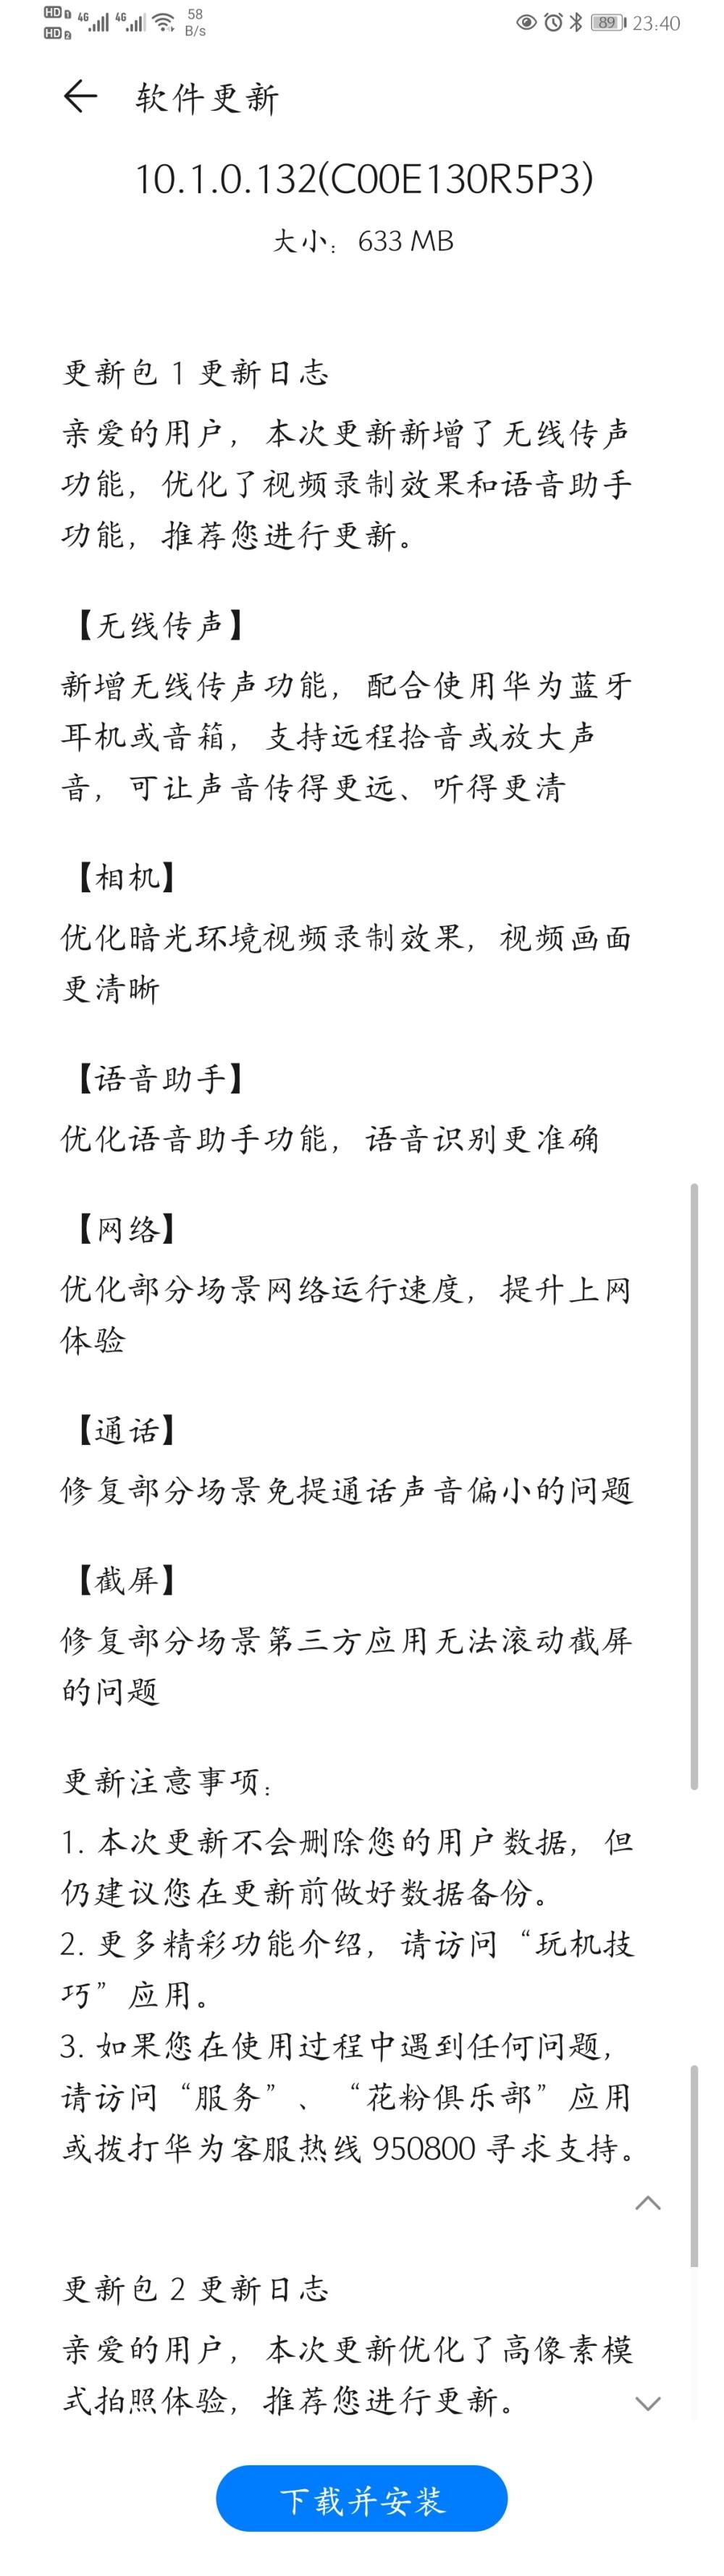 Huawei Mate 30 series getting EMUI 10.1.0.132